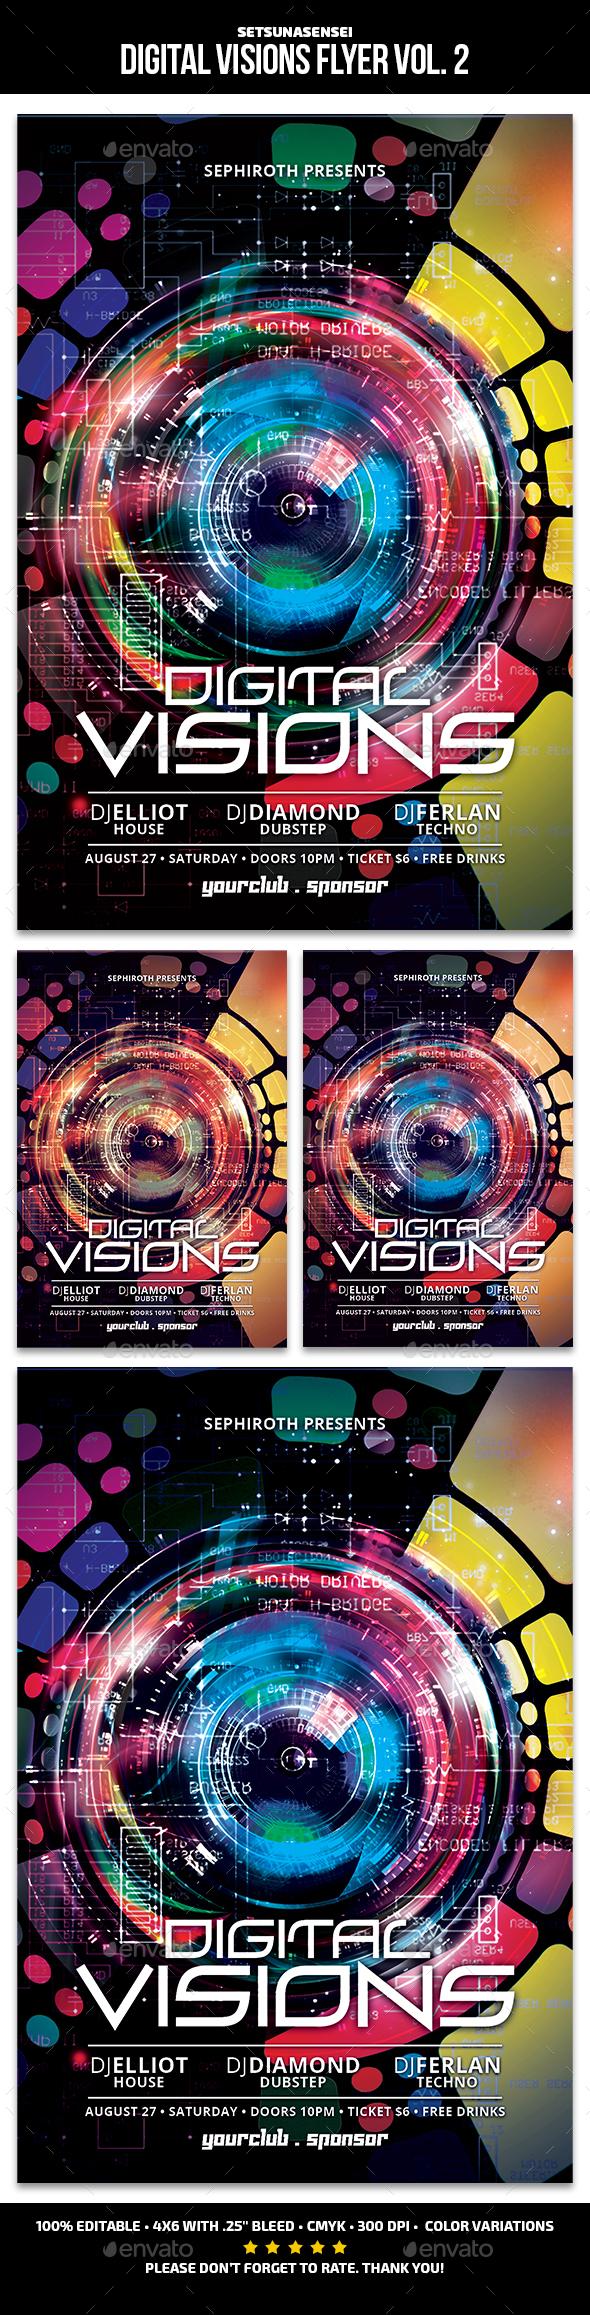 Digital Visions Flyer Vol. 2 - Clubs & Parties Events